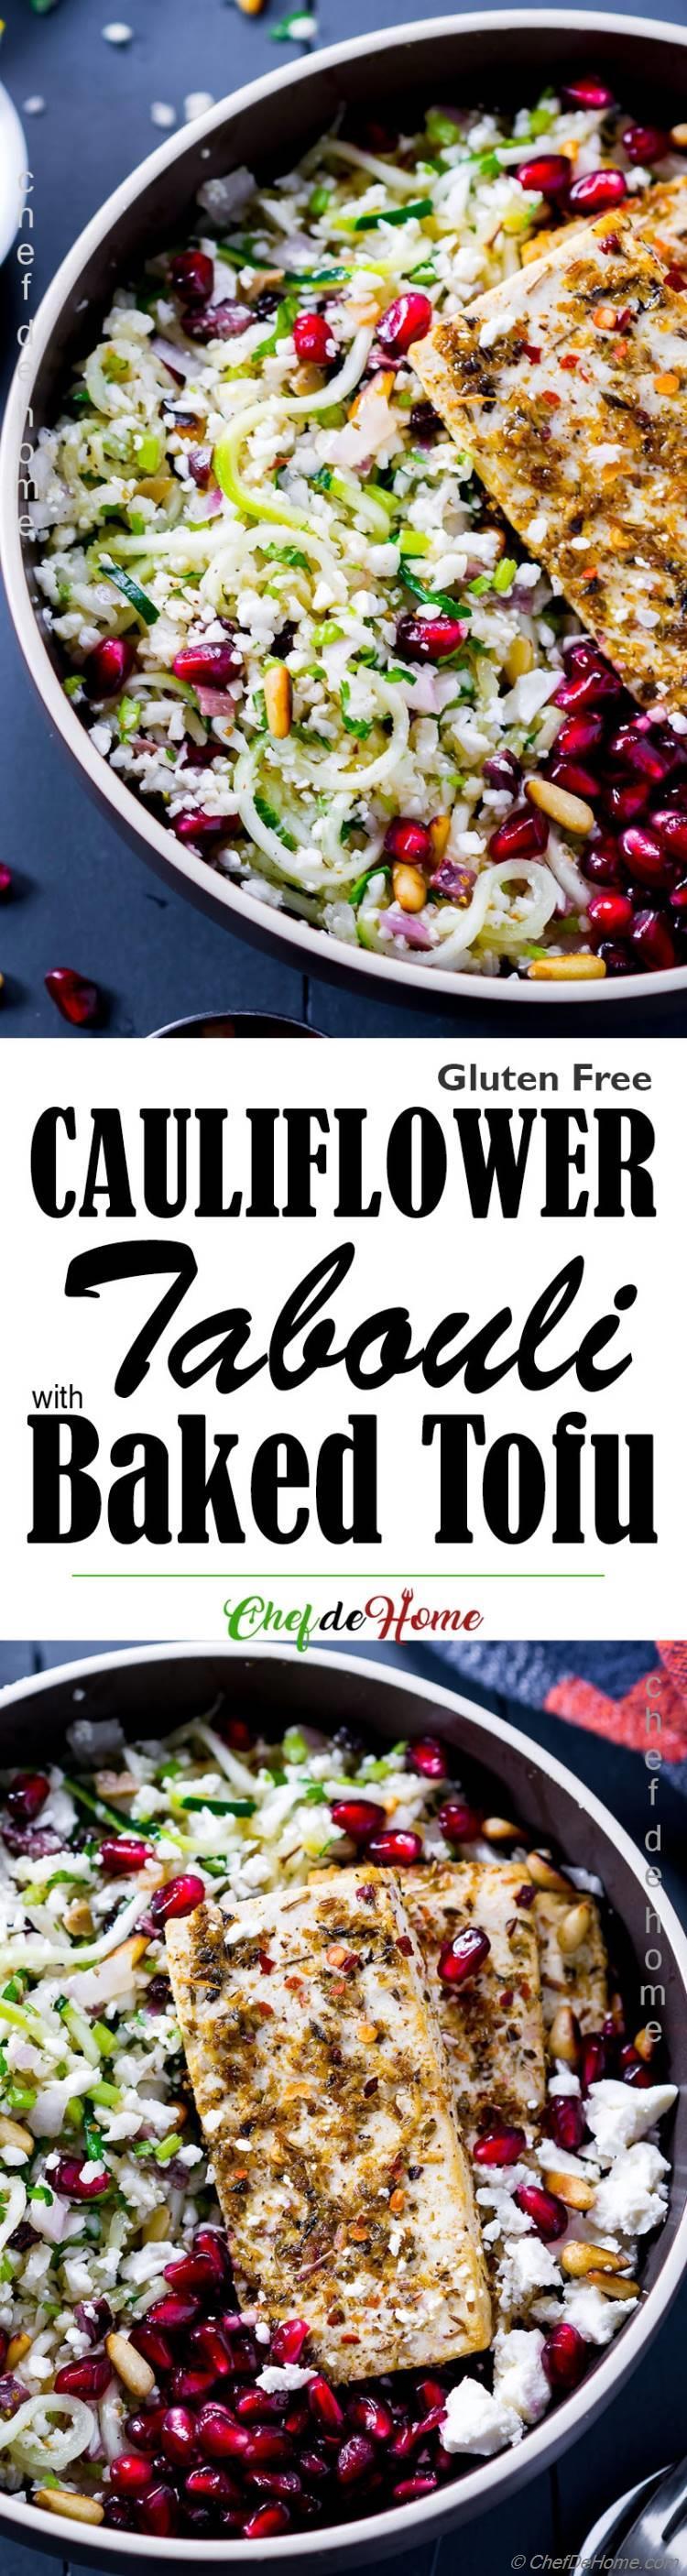 Cauliflower Low Carb Tabouleah Salad